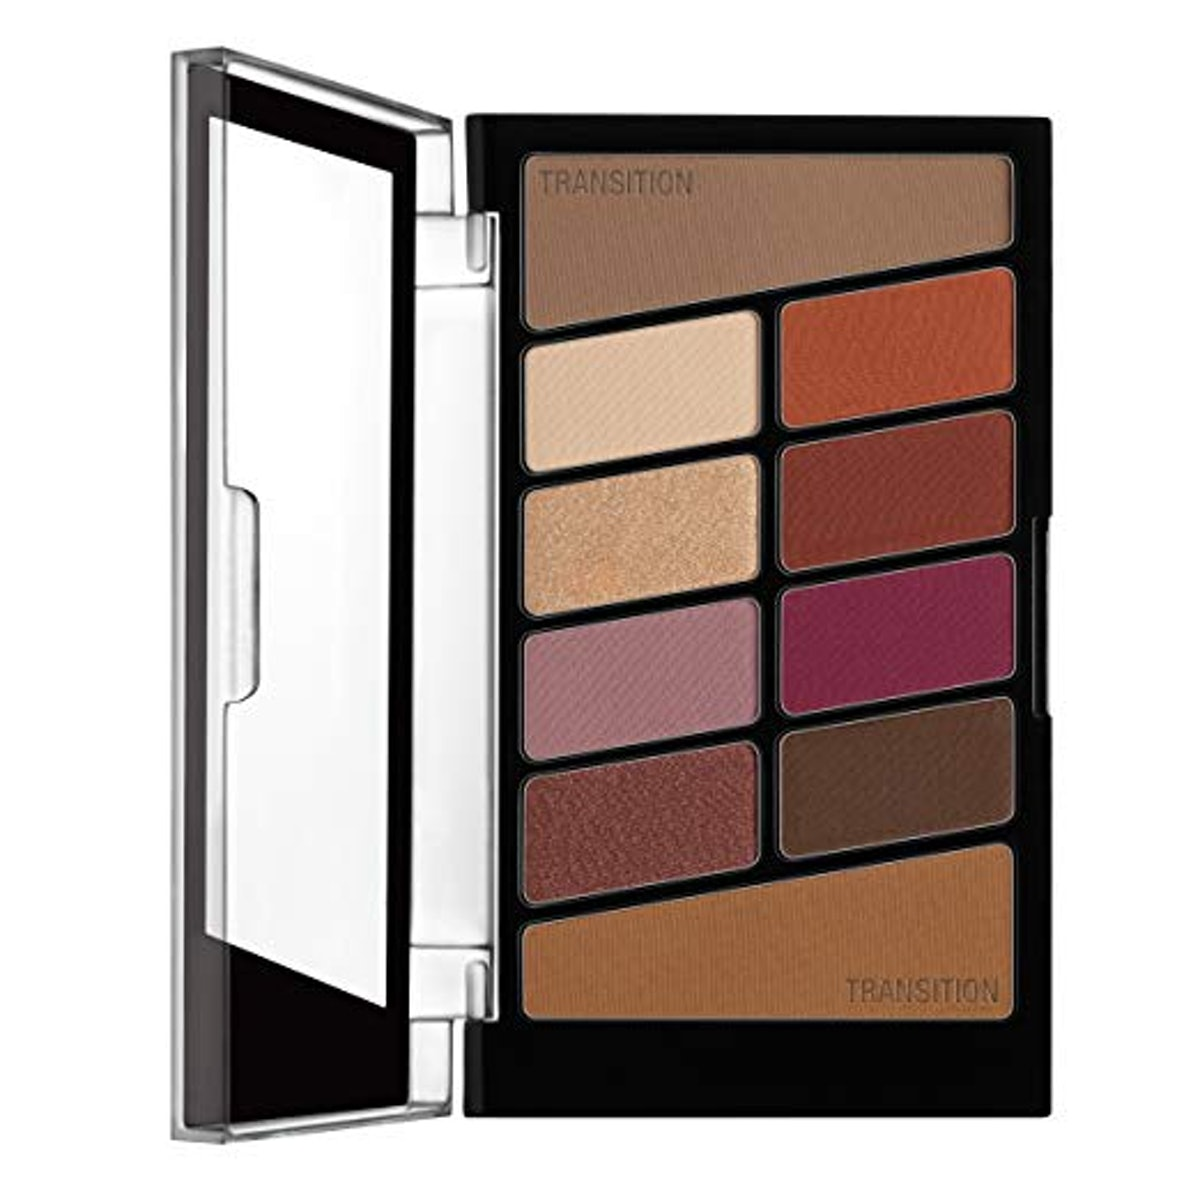 Wet n' Wild Color Icon Eyeshadow 10 Pan Palette, Rose in the Air